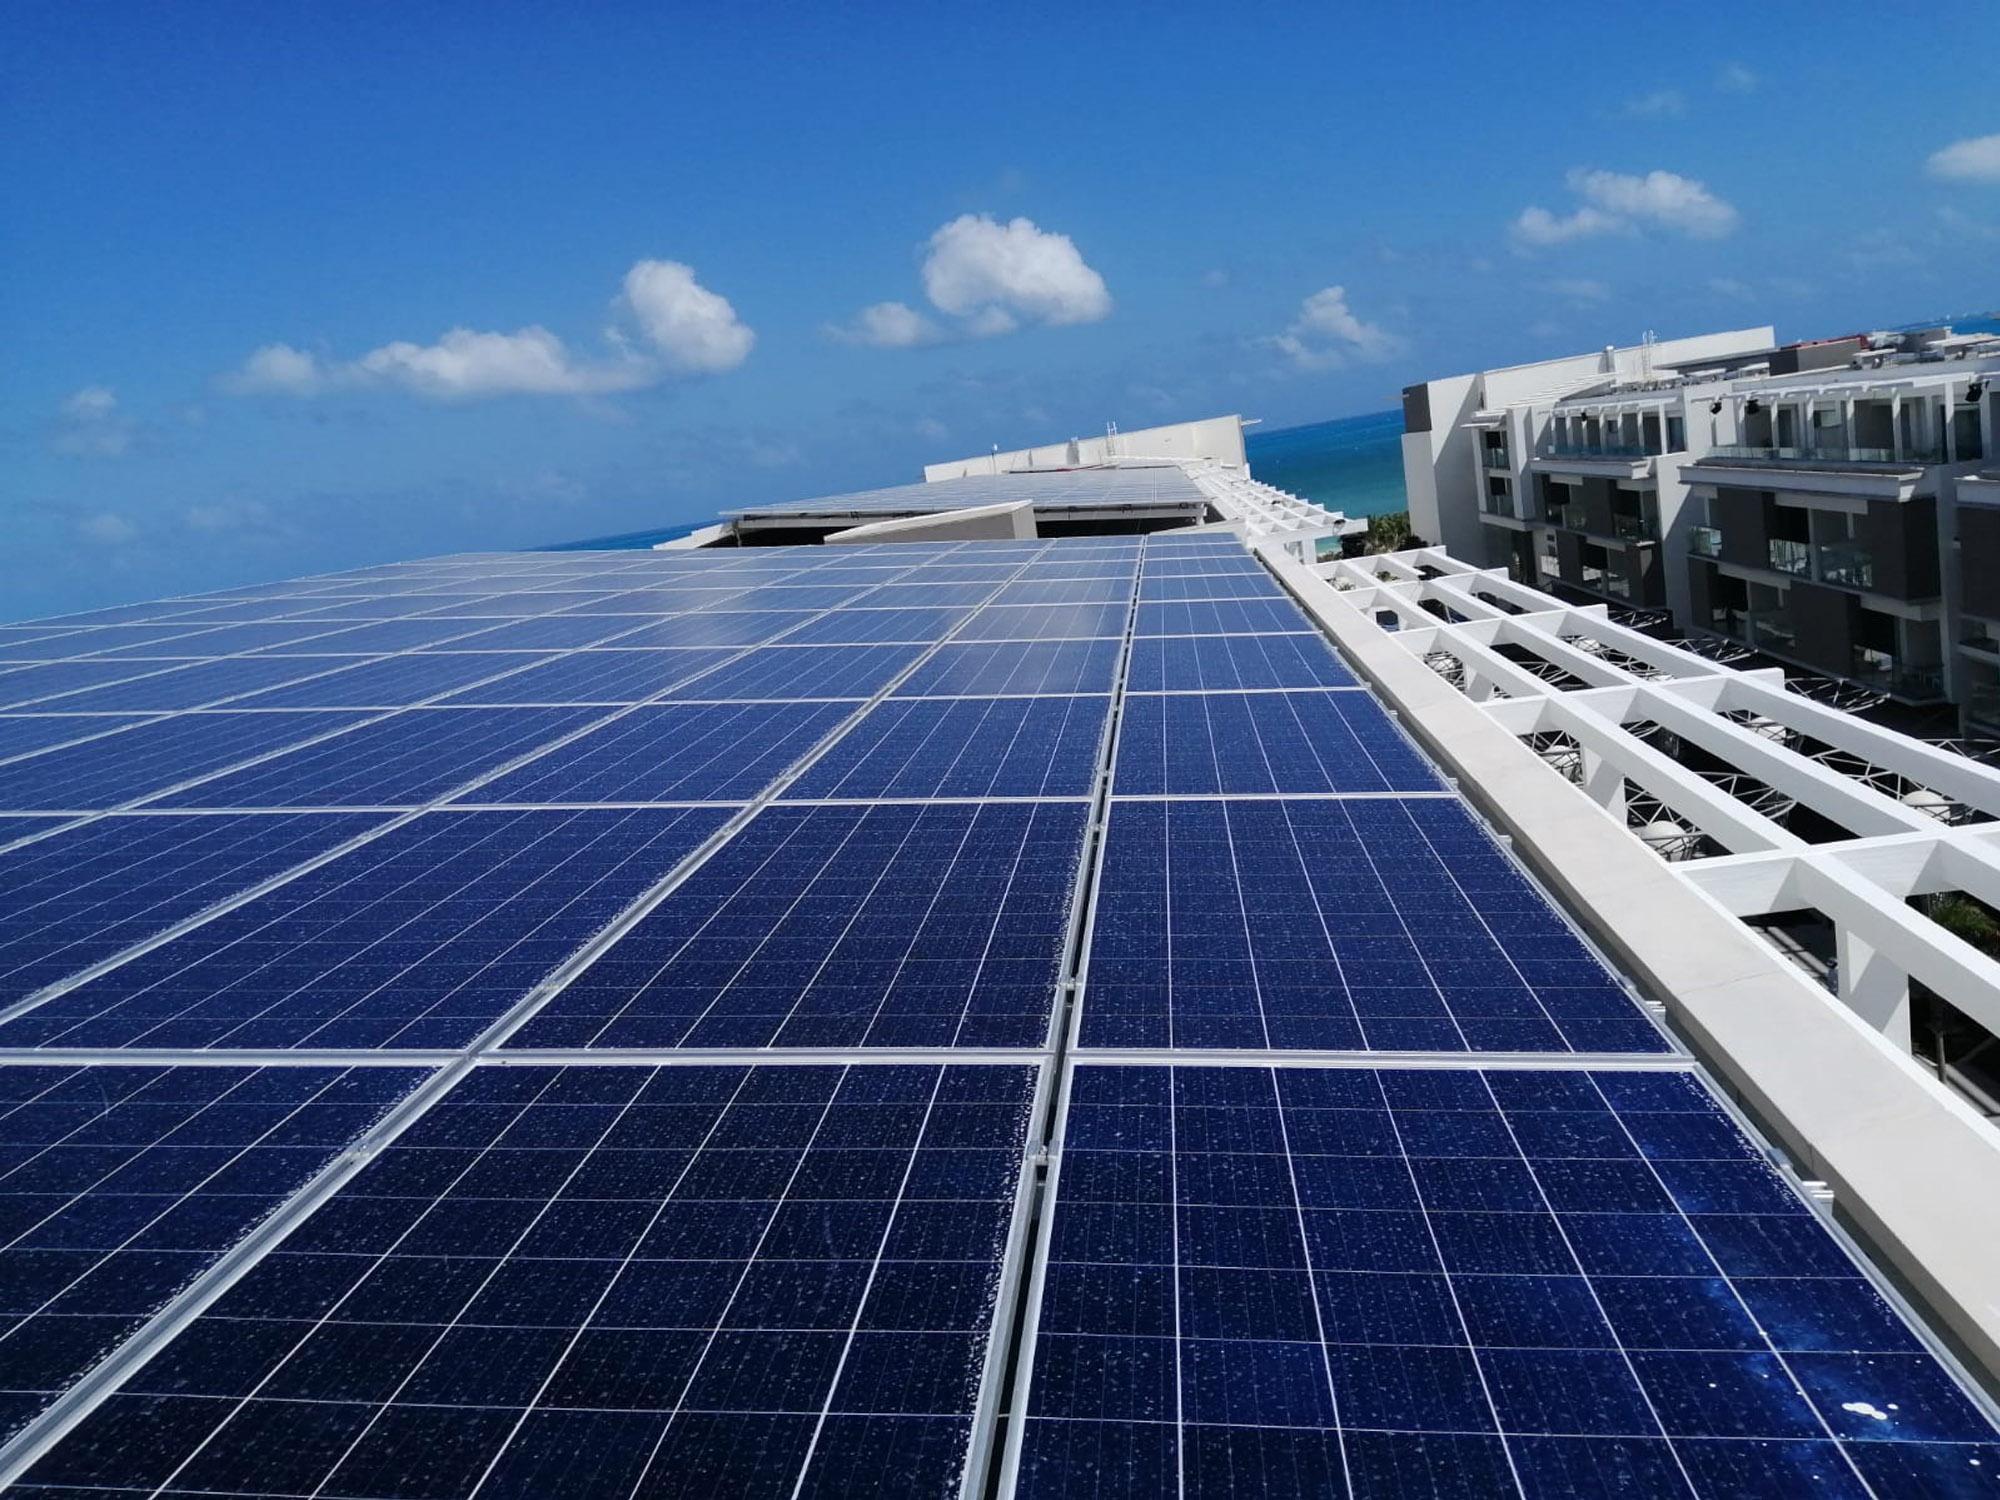 proyecto-placas-solares-hoteles